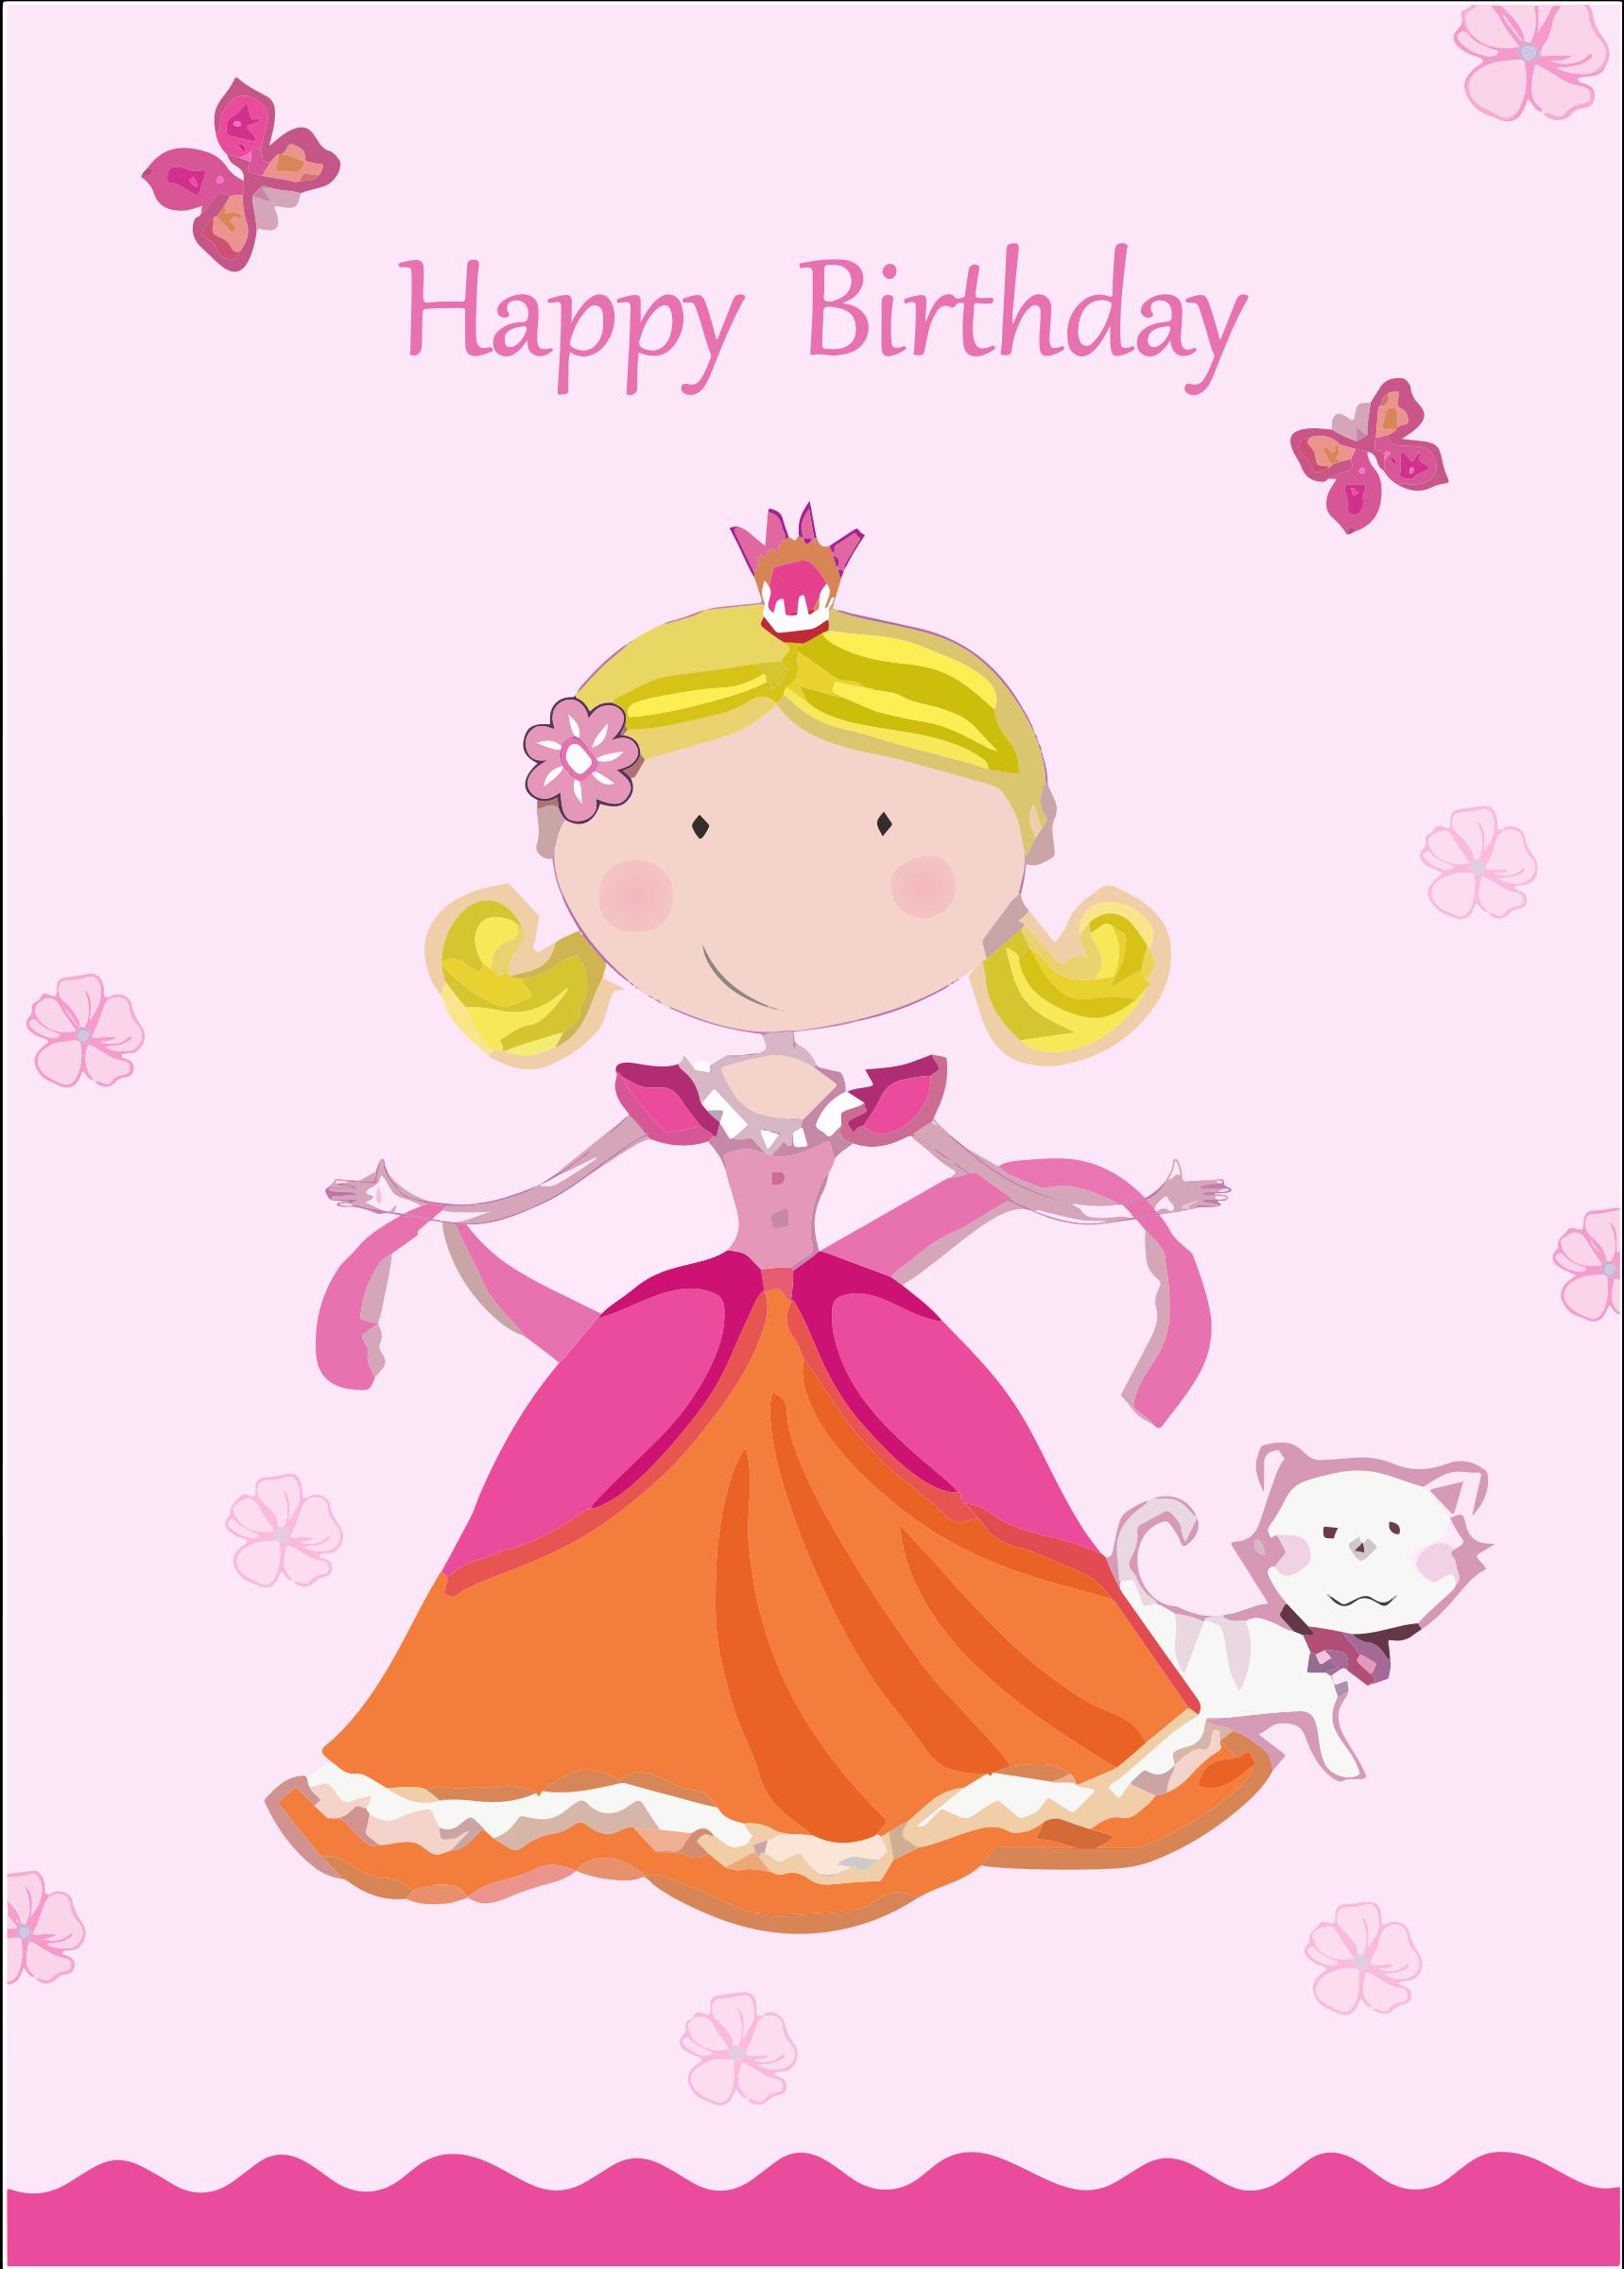 Cards clipart animated Animated Card Clipart Animated Birthday